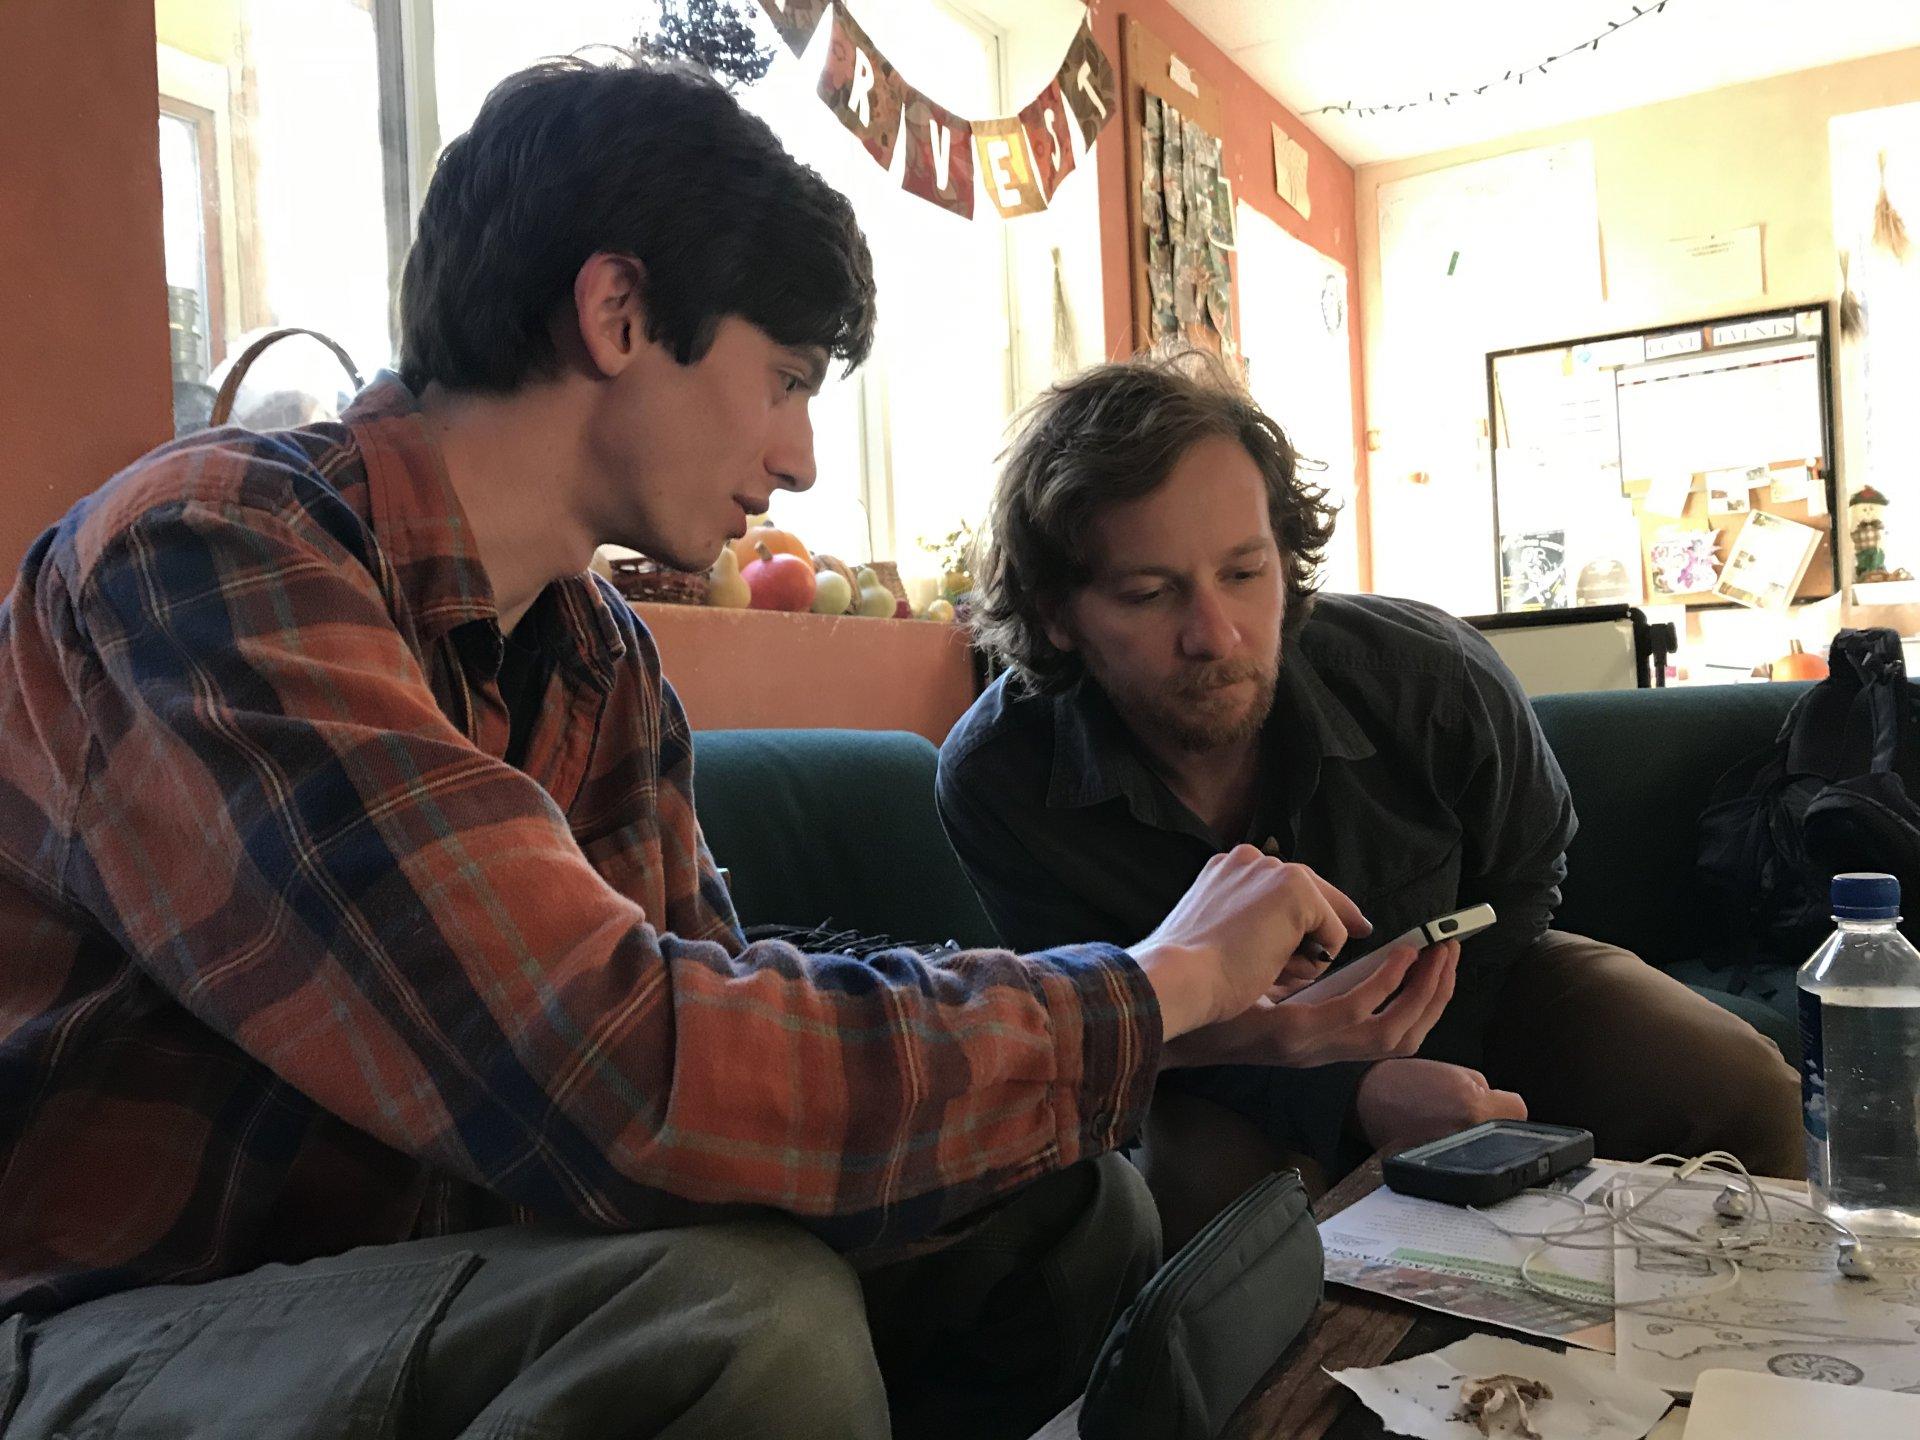 Lucas Burton and Caleb Von Rossum work on tying their iNaturalist posts with their specimens. | Photo by Collin Slavey